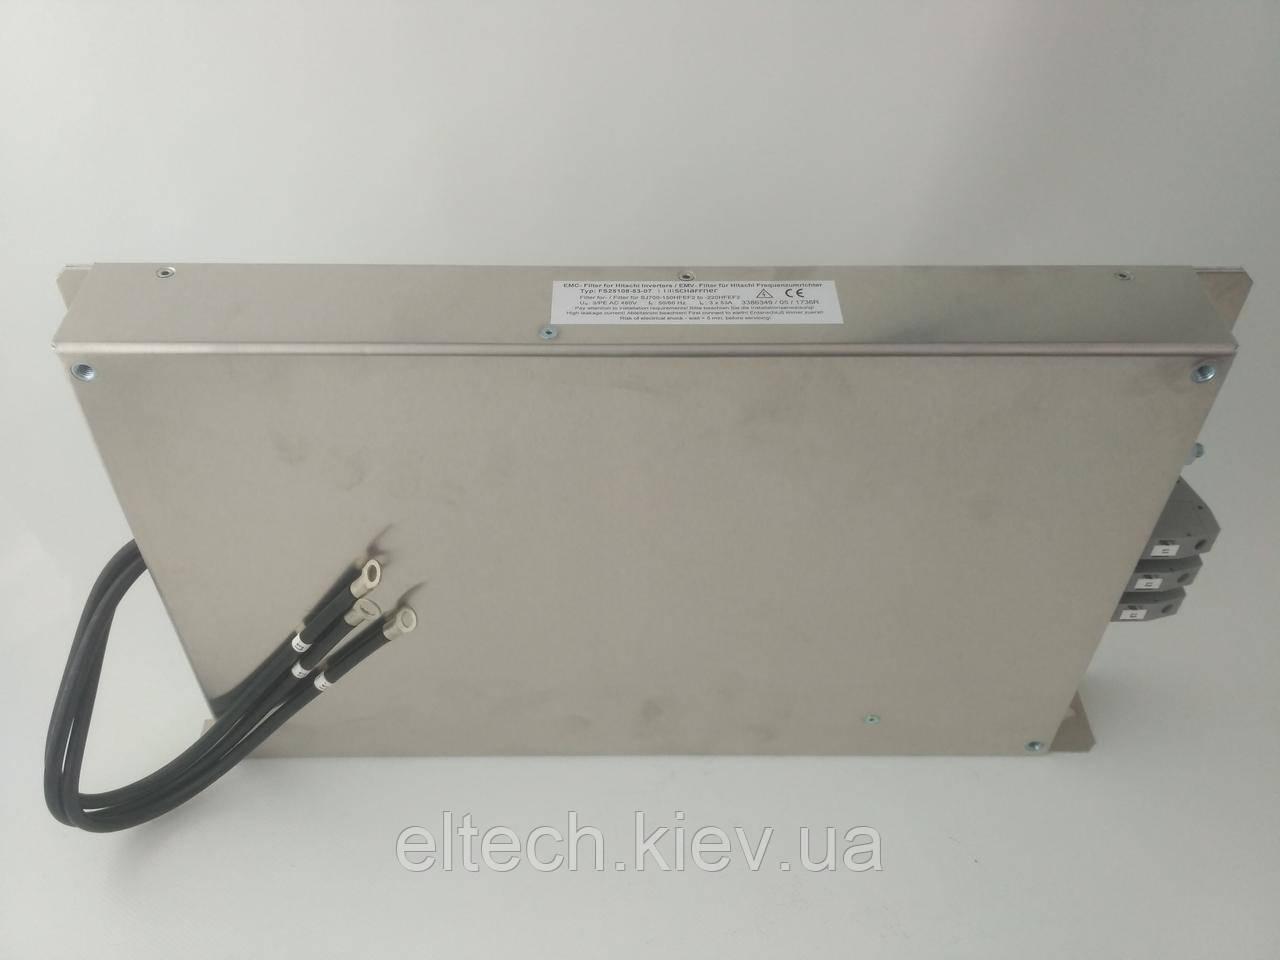 Фильтр сетевой FS25108-53-07 для SJ700B-(185,220,300)HFF